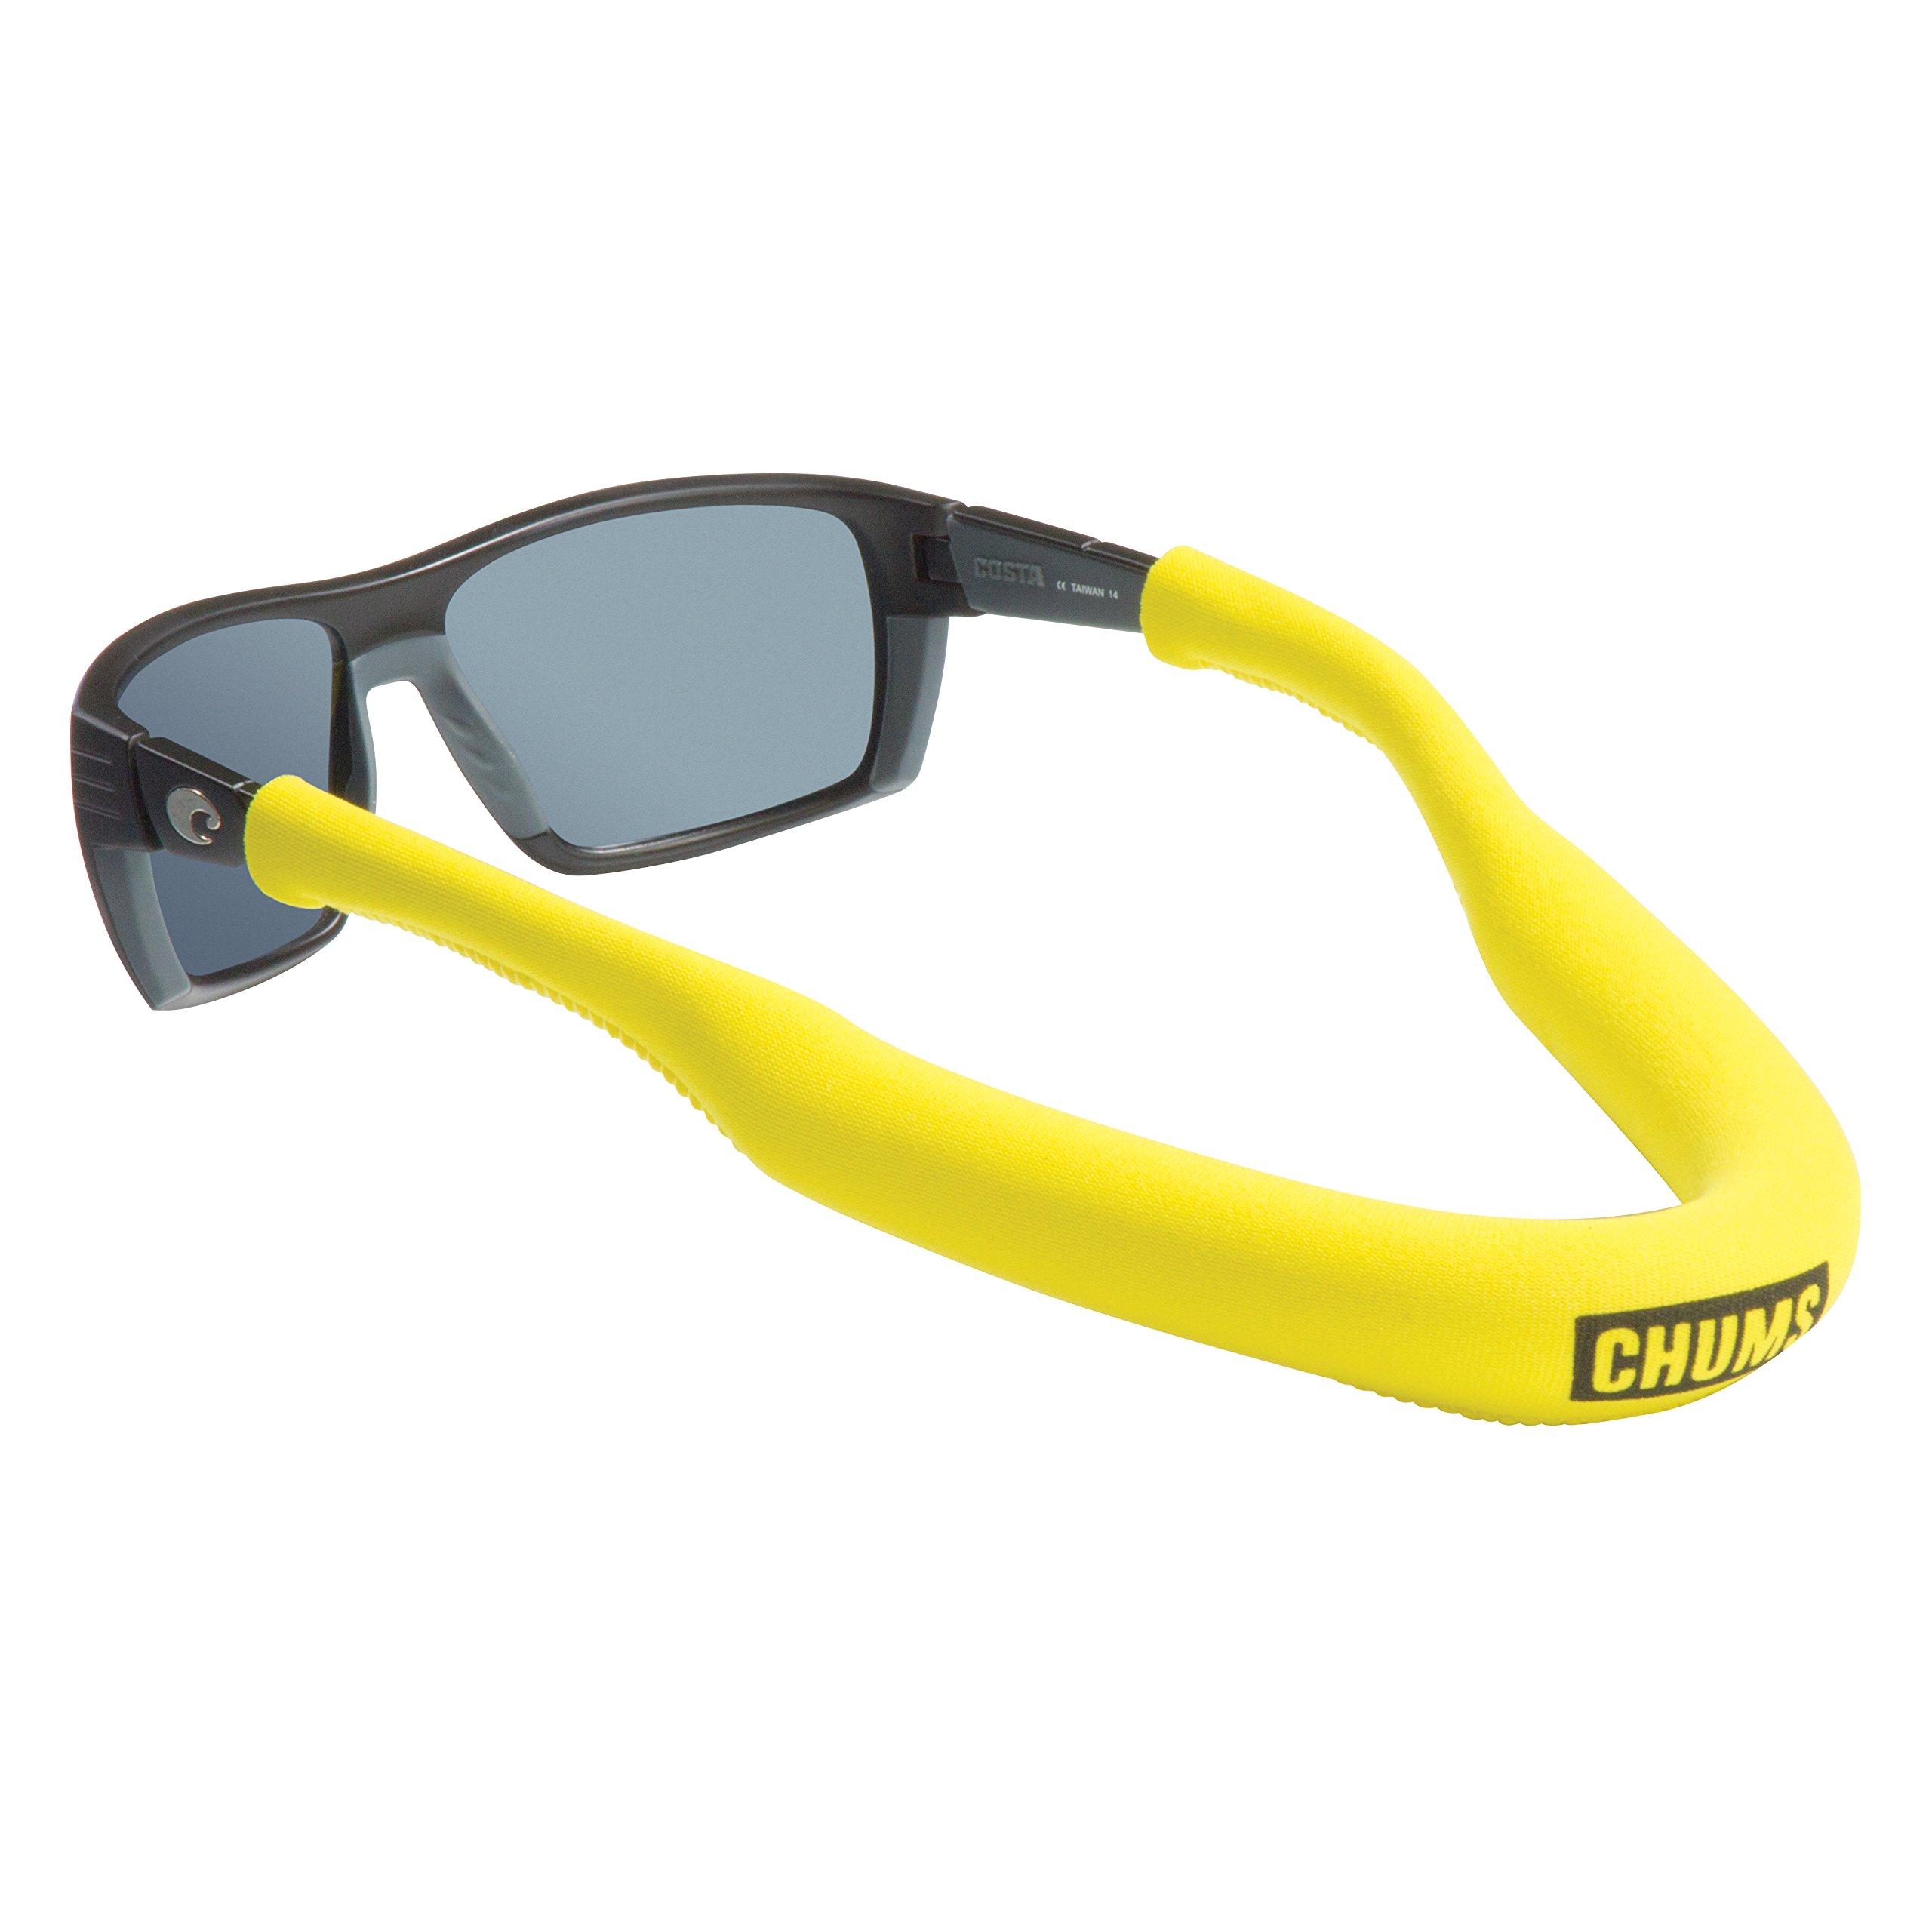 Chums Neo Megafloat Eyewear Eyewear Retainer, Yellow by Chums